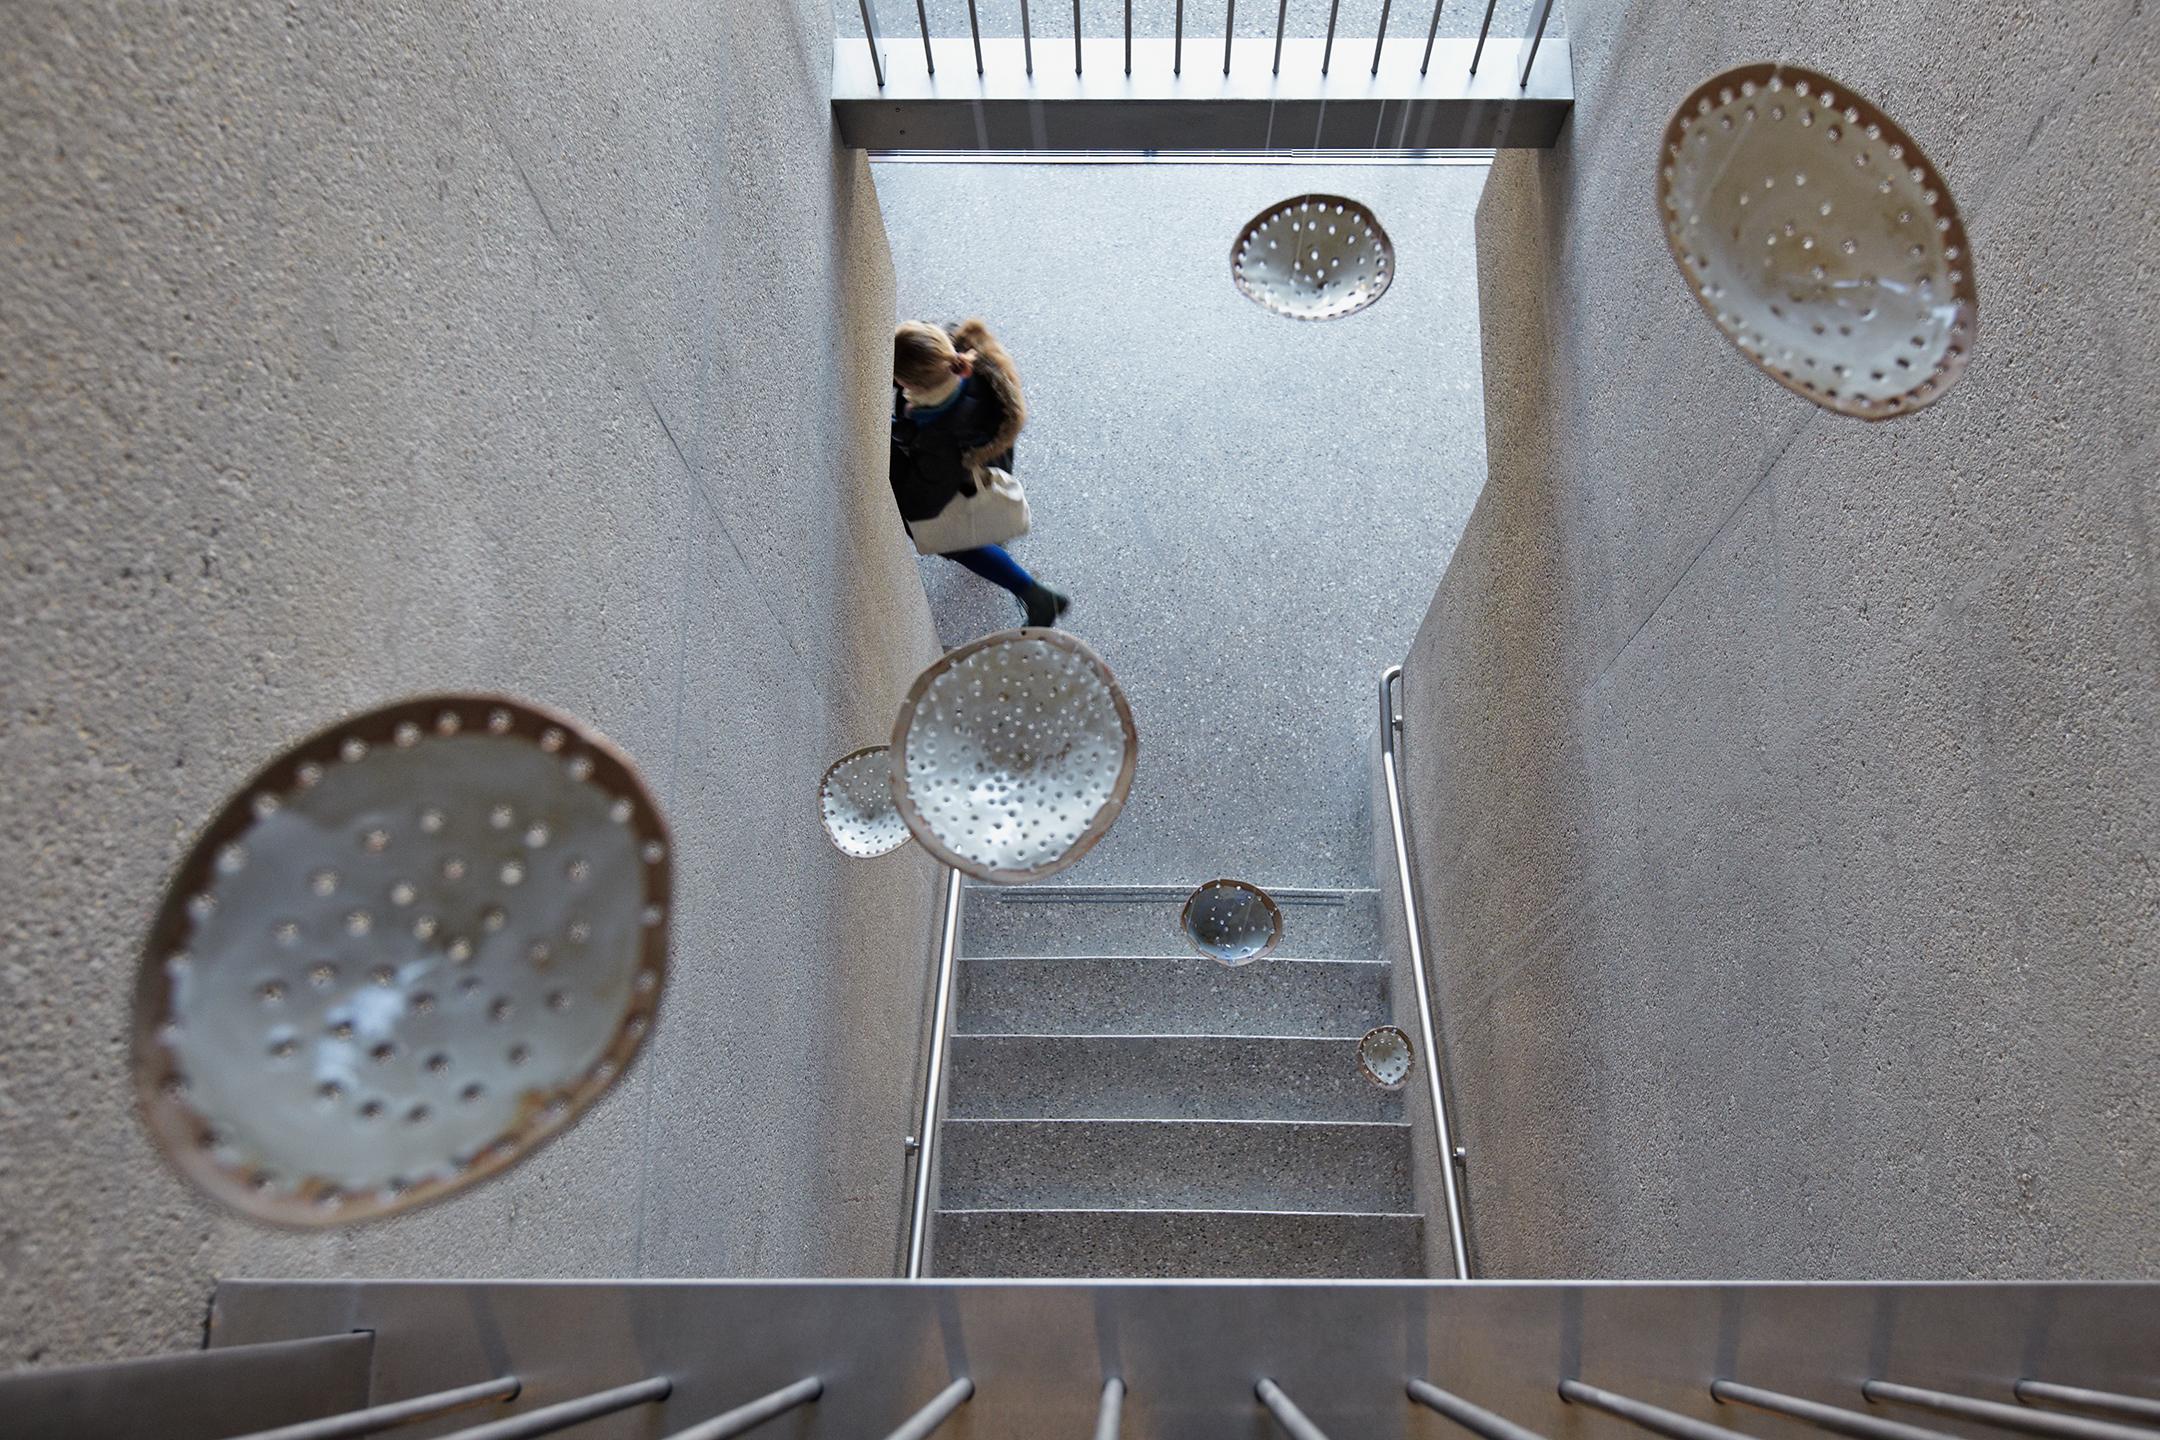 TOD WILLIAMS BILLIE TSIEN ARCHITECTS / Reva and David Logan Center for the Arts / University of Chicago